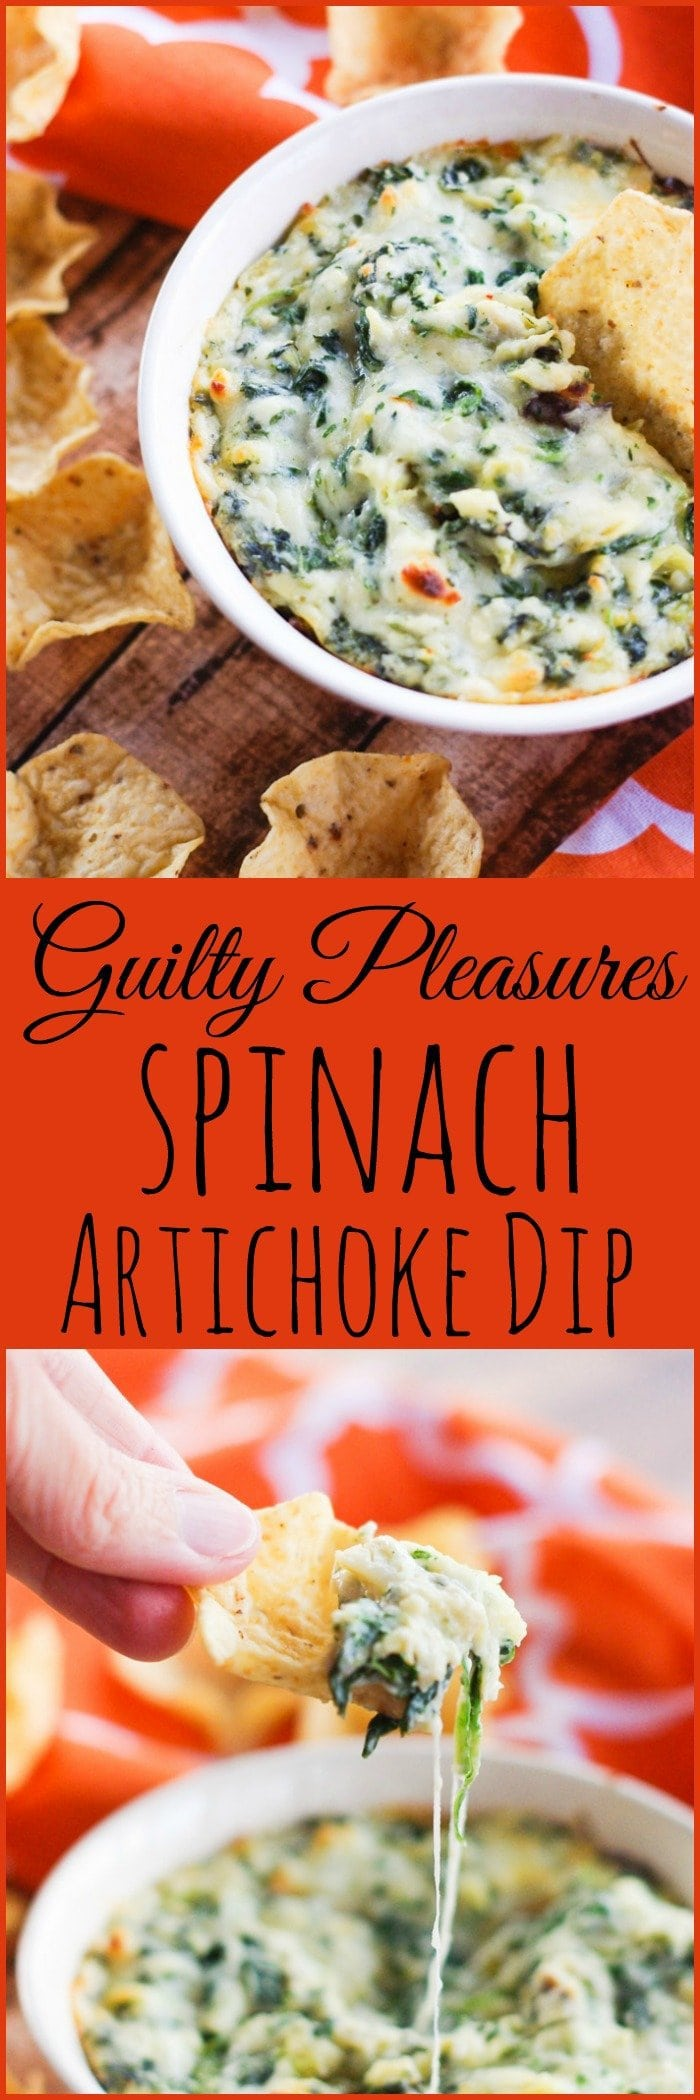 Guilty Pleasures Spinach Artichoke Dip | www.homeandplate.com | It